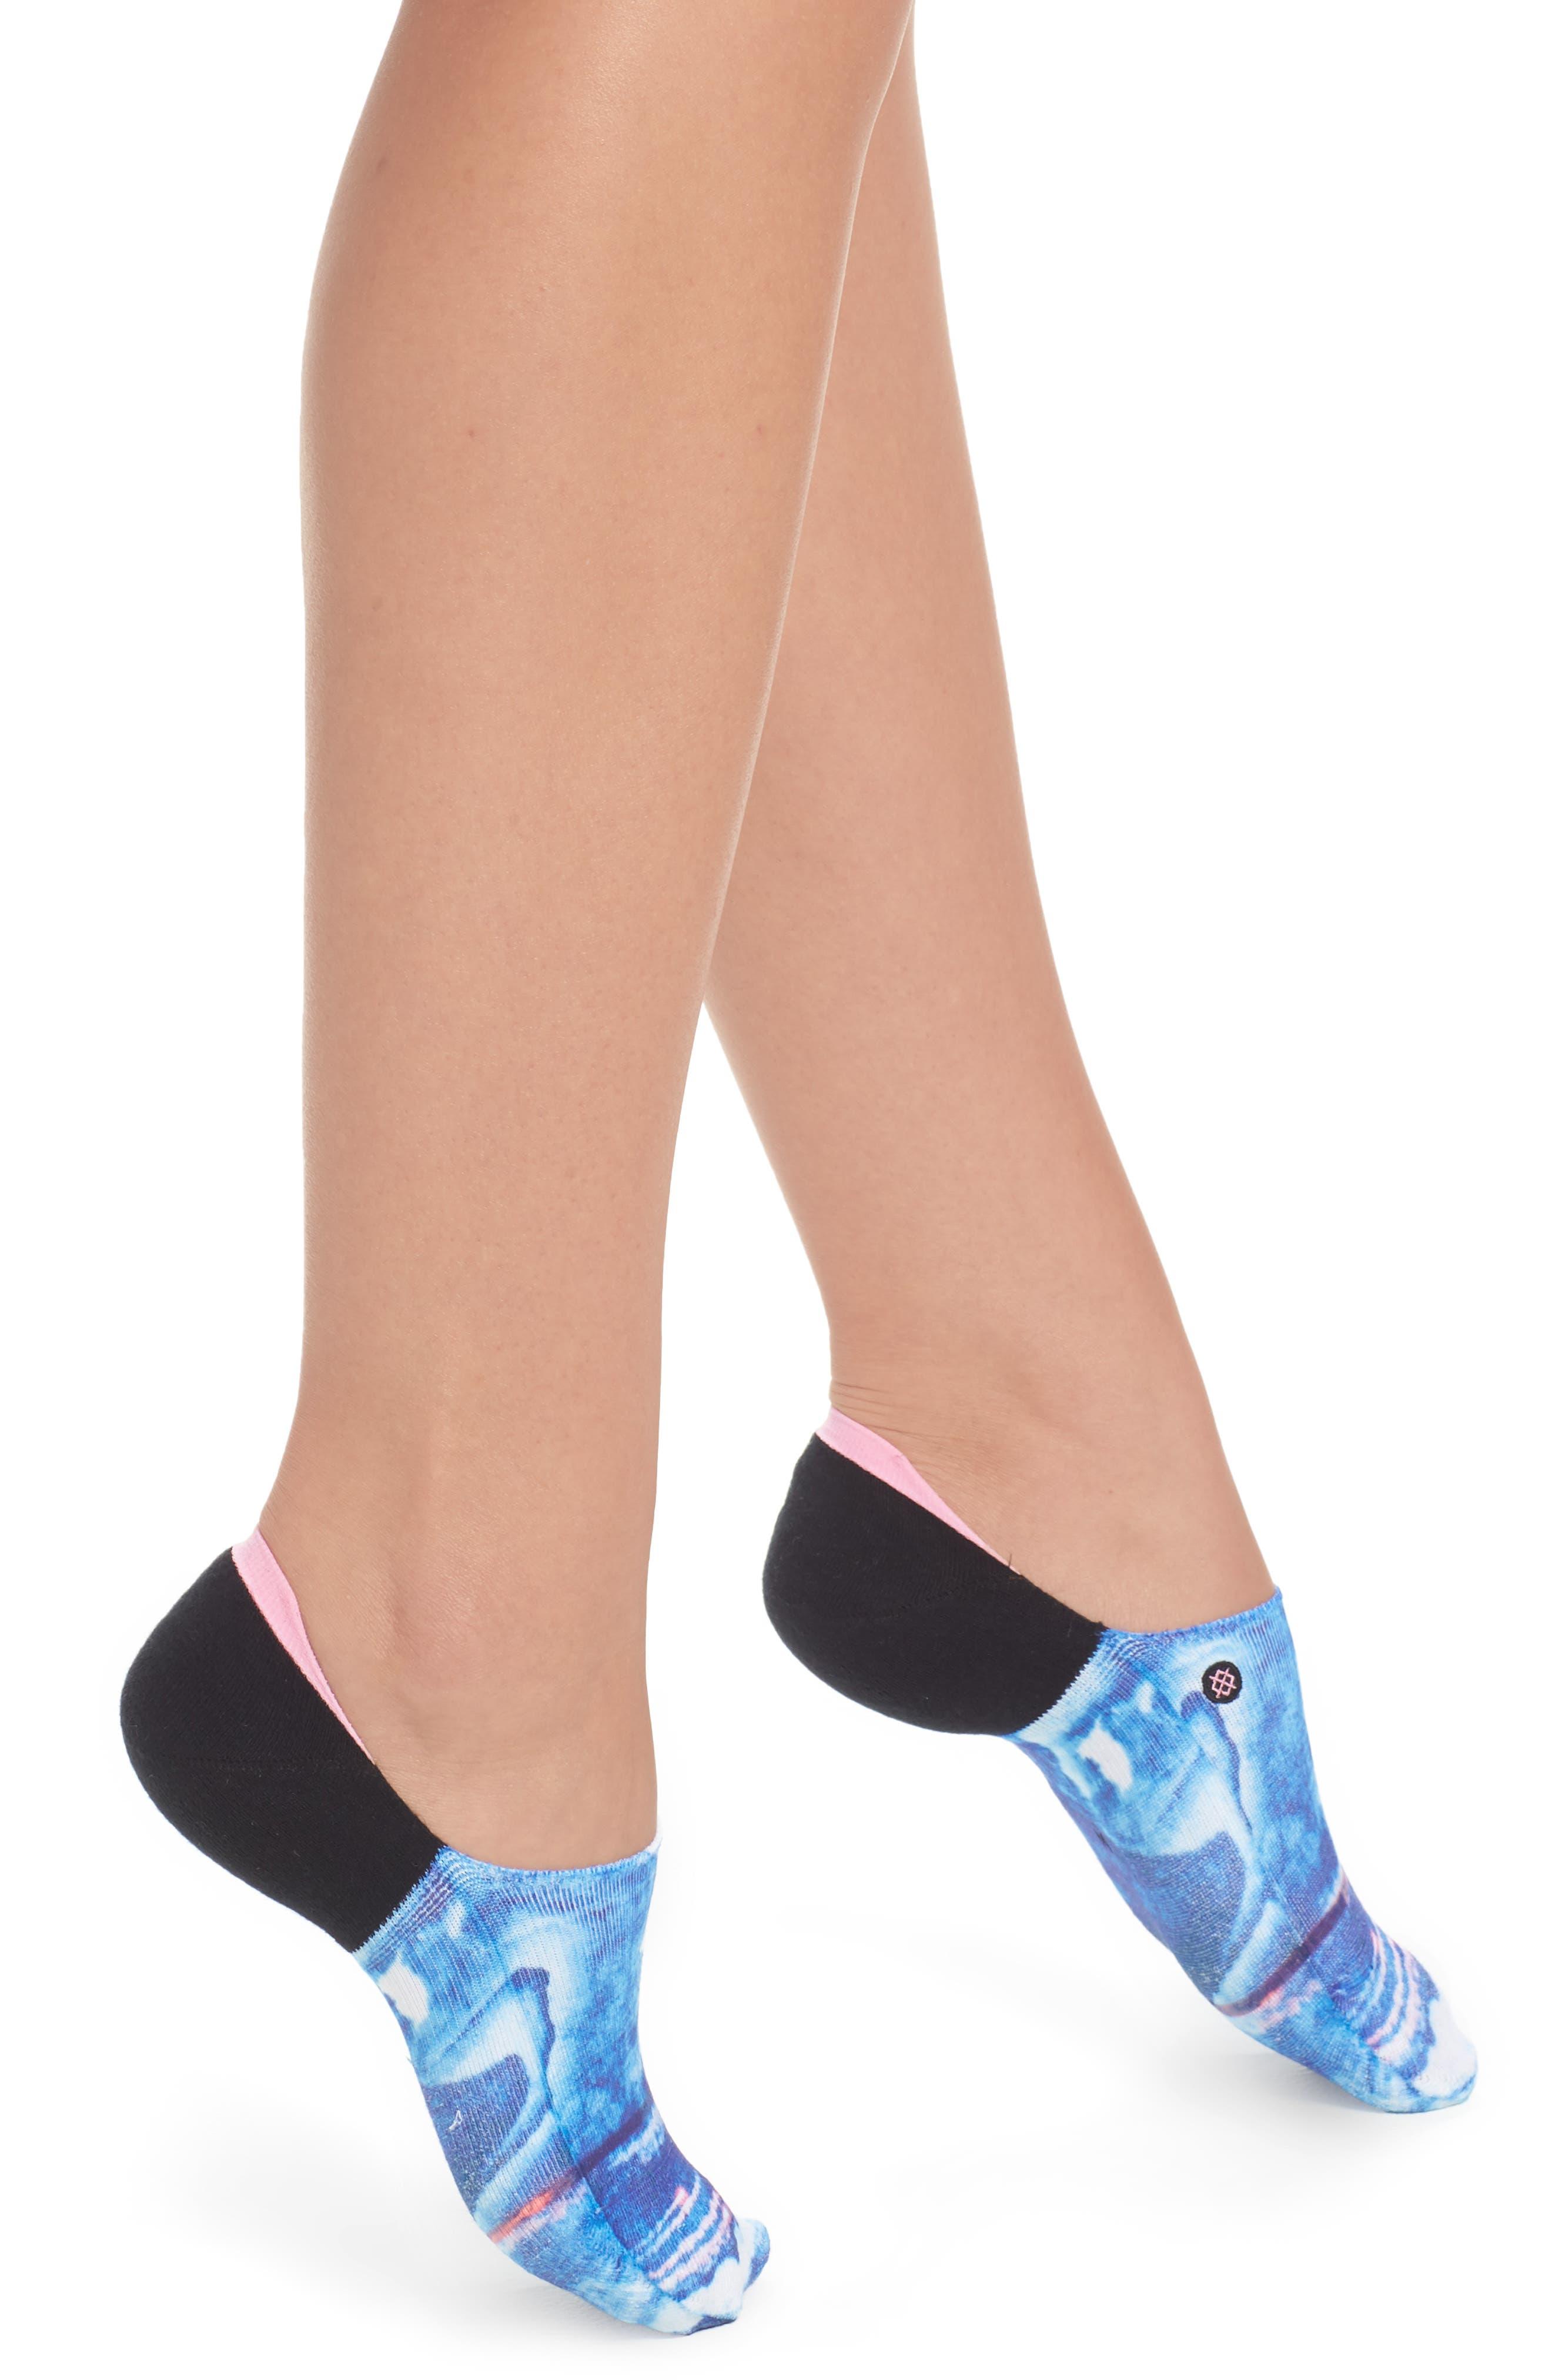 Tropic Storm No-Show Socks,                             Main thumbnail 1, color,                             Blue